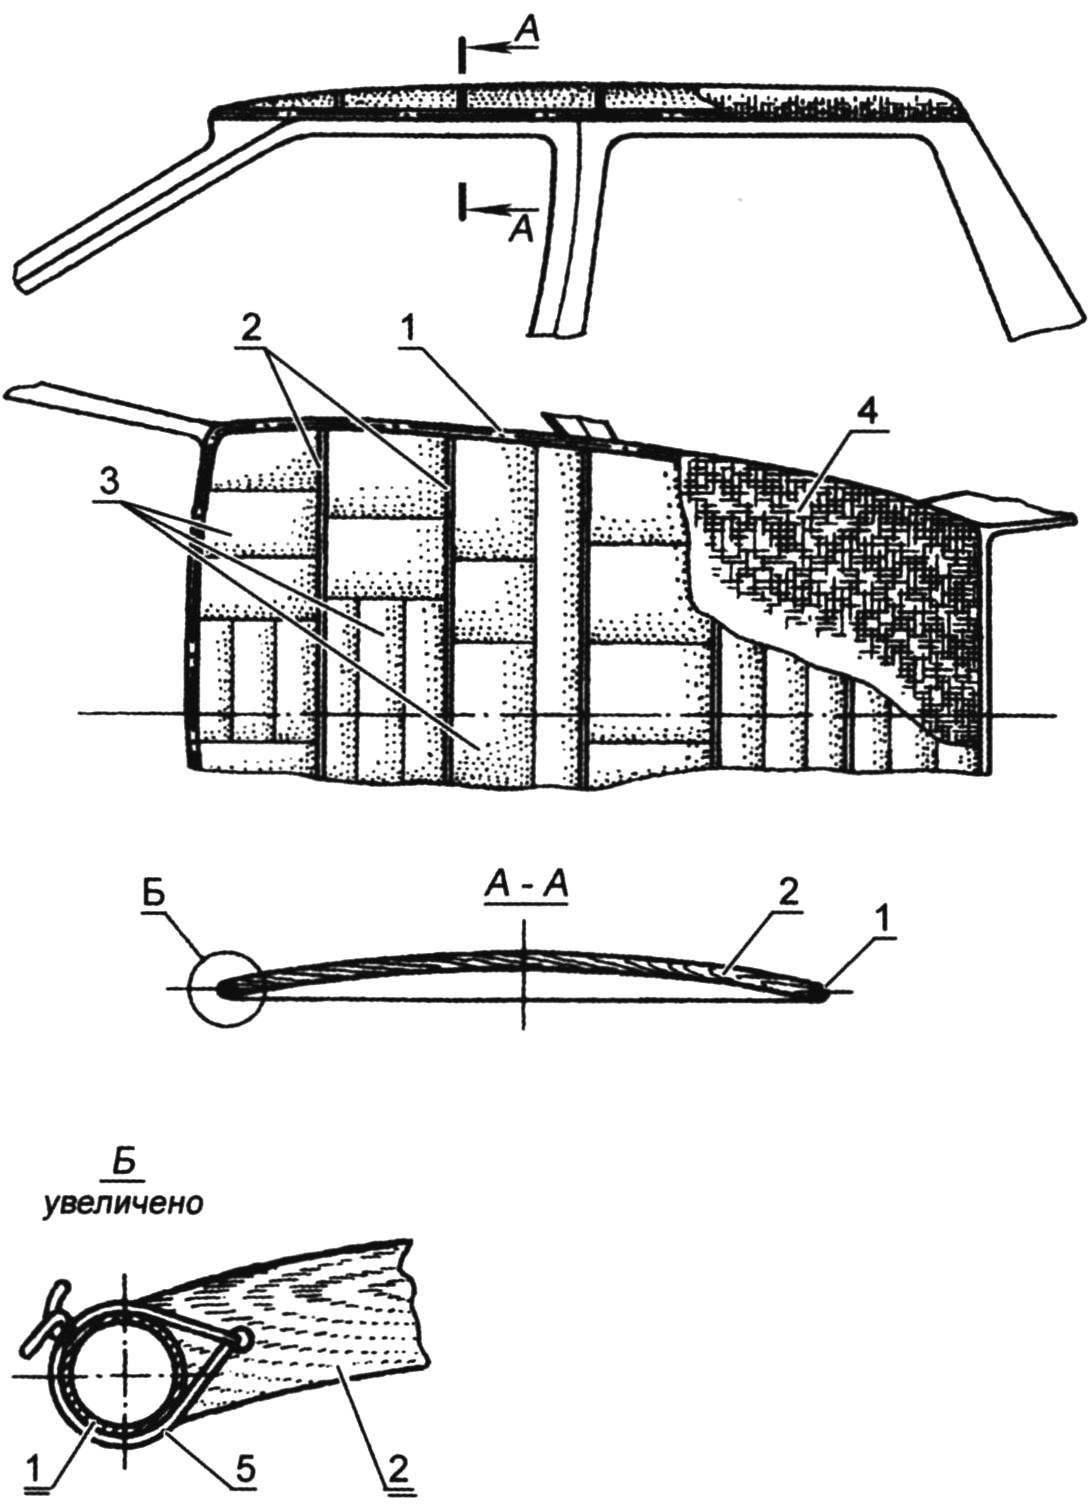 Формообразование кузова трицикла